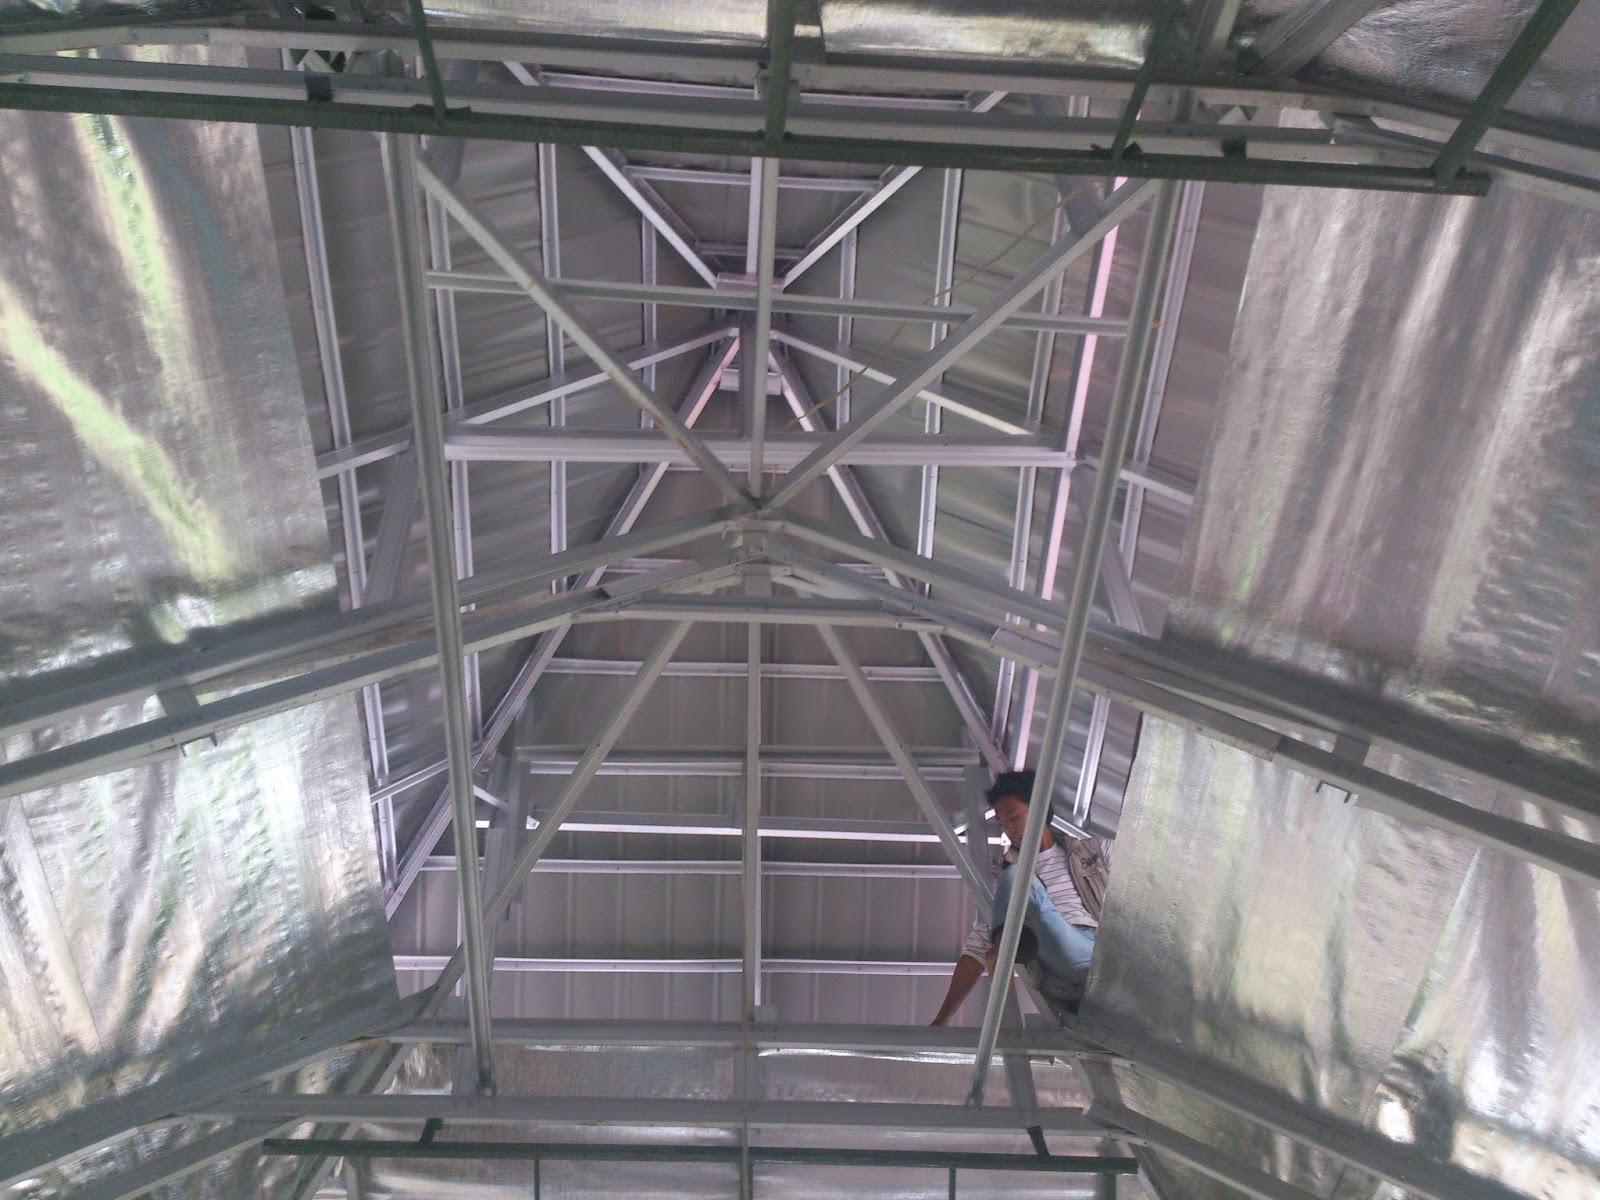 harga atap baja ringan zinc inder karya | inkay: teknologi terbaru ...